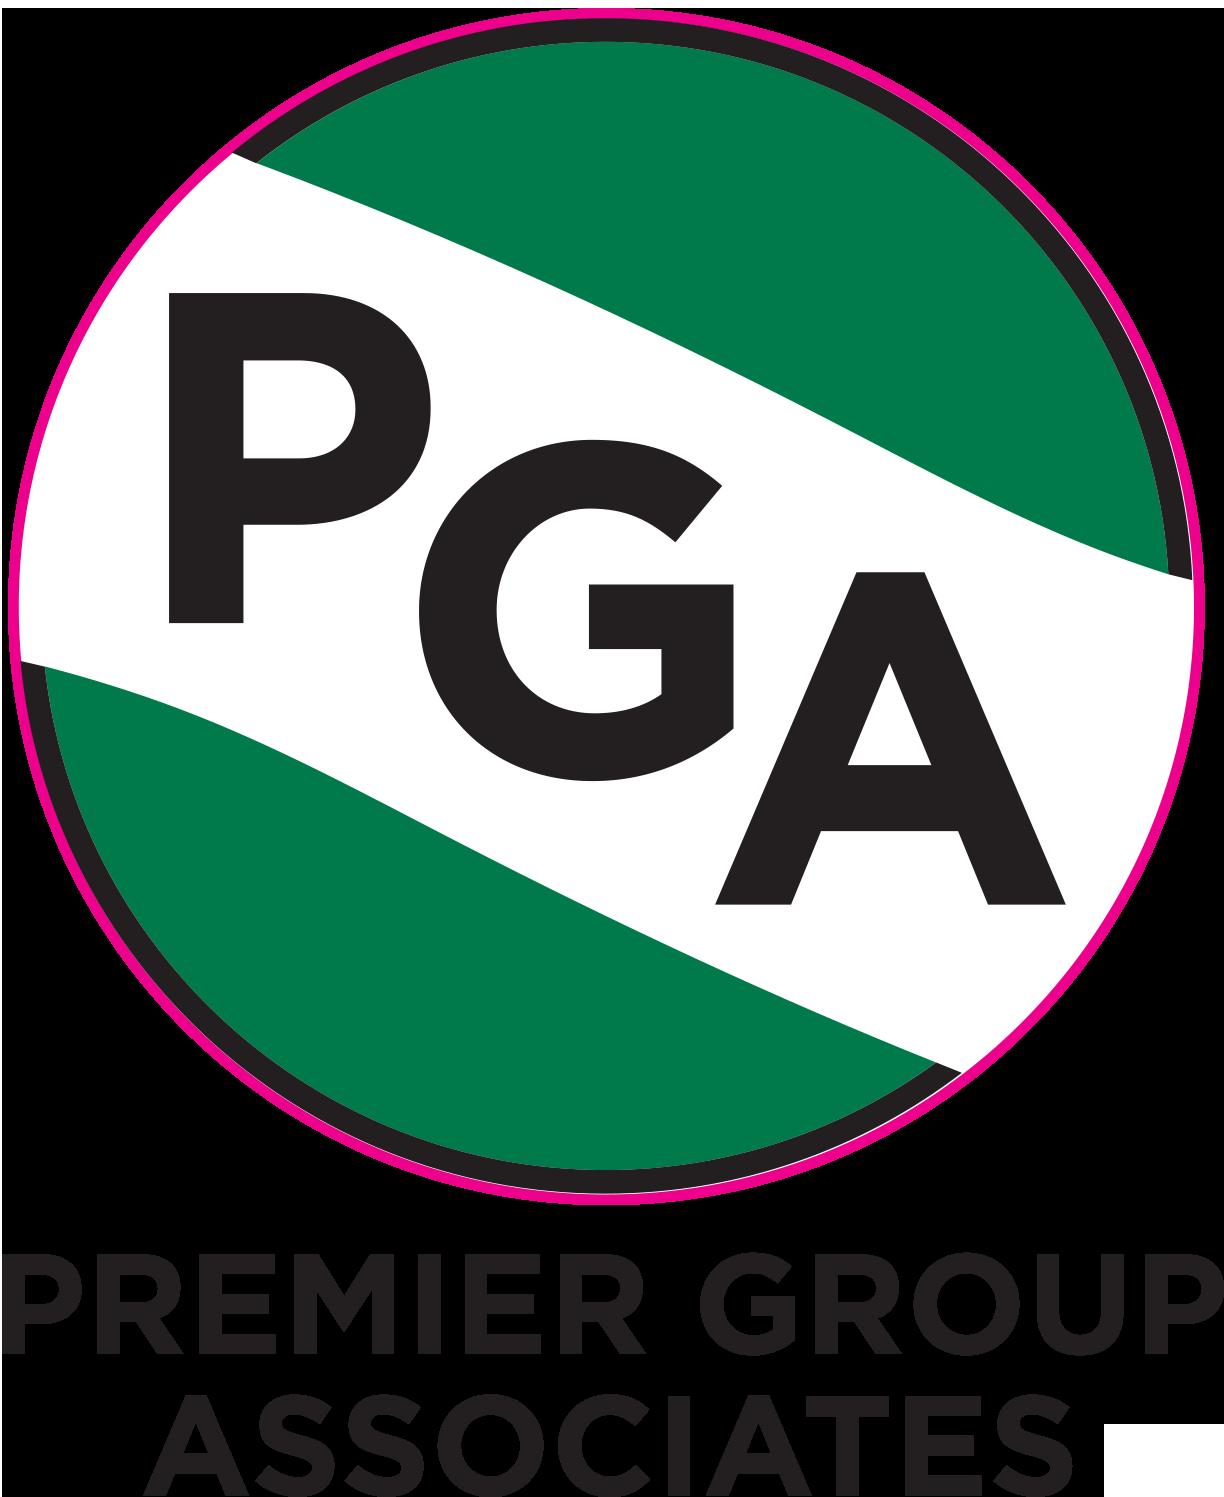 Premier group associates logo